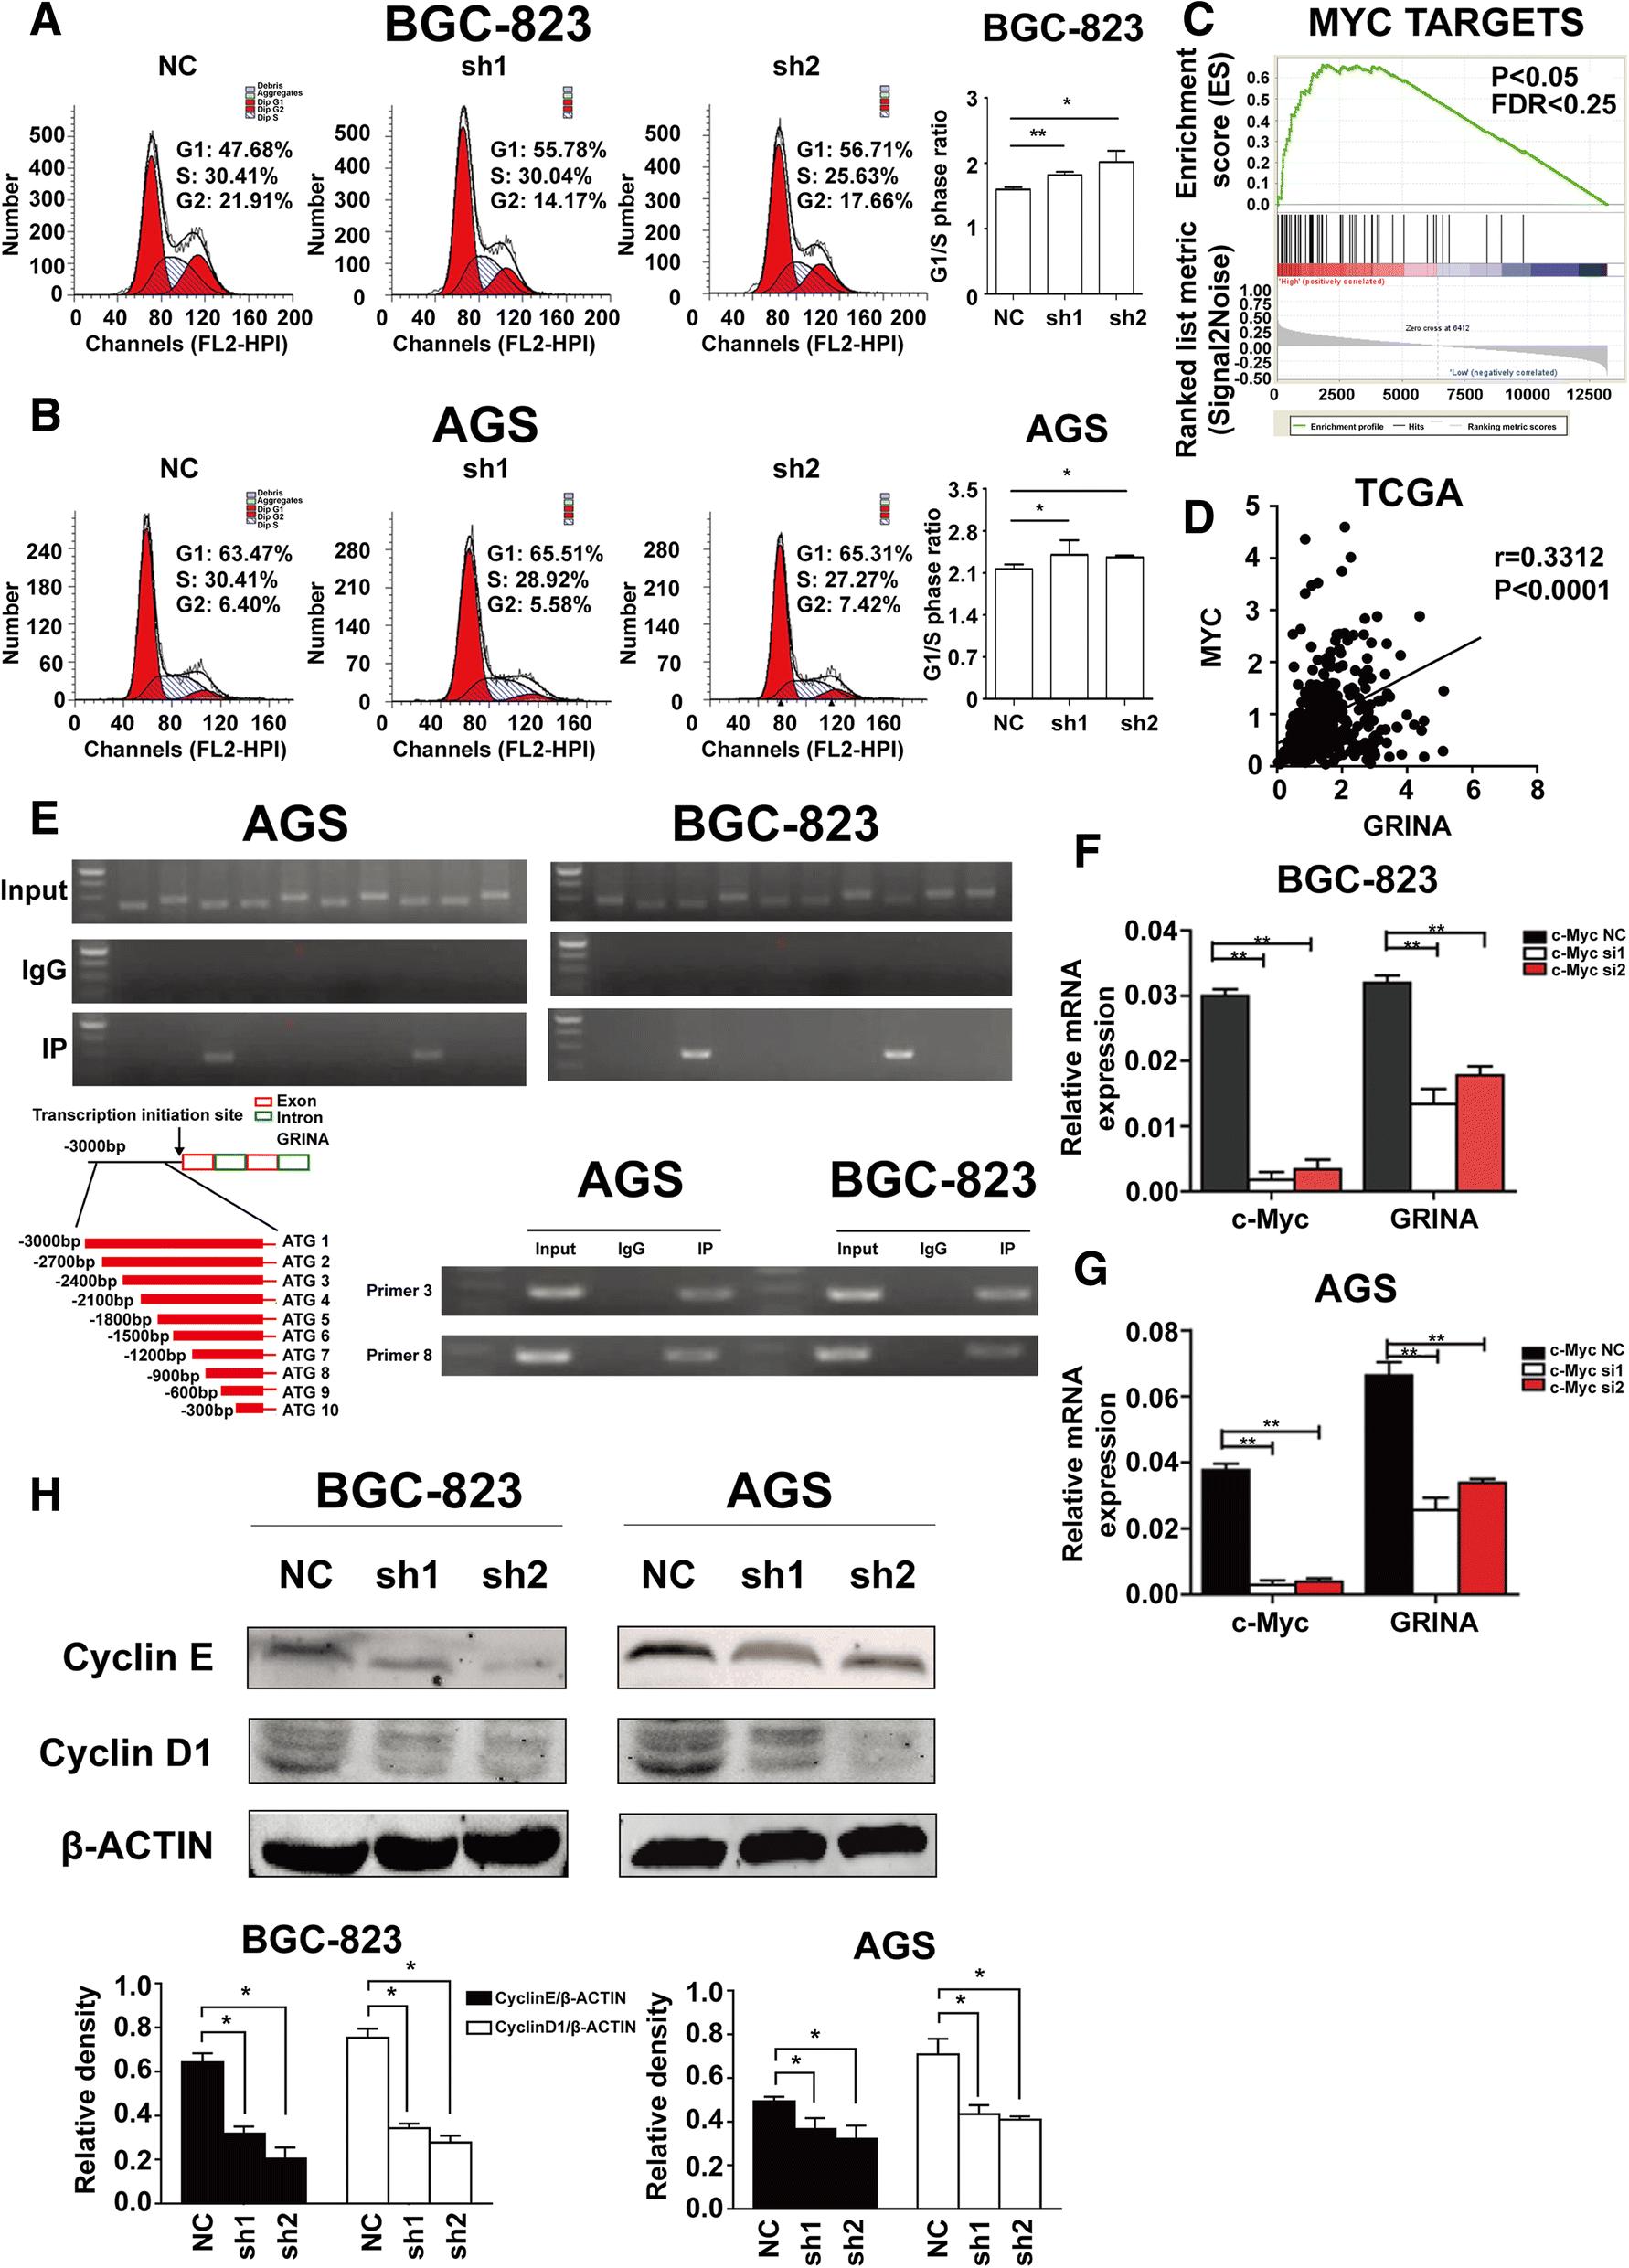 Transmembrane protein GRINA modulates aerobic glycolysis and